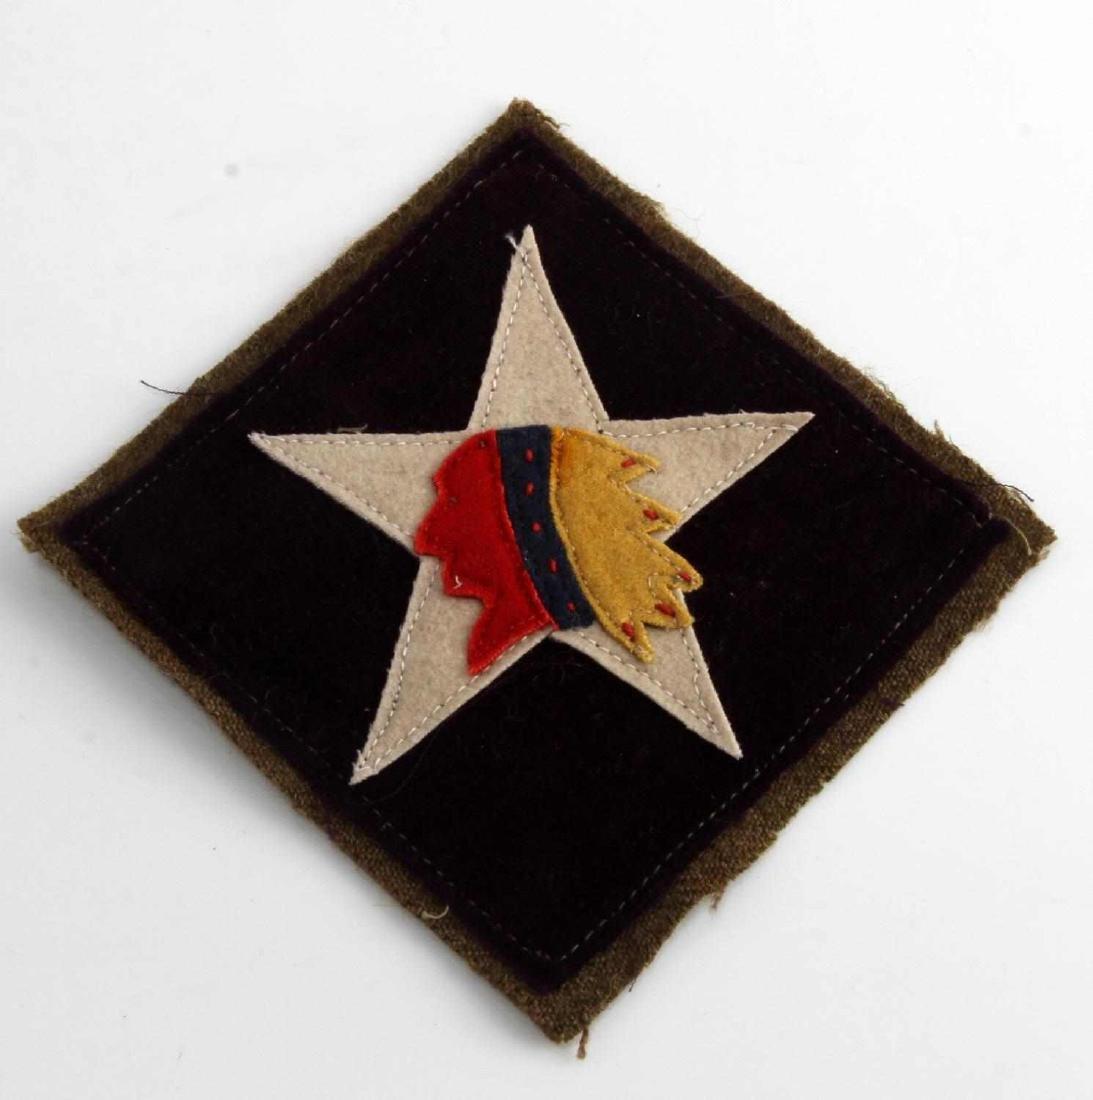 USMC WWI 6TH MARINE MG REGIMENT SHOULDER PATCH